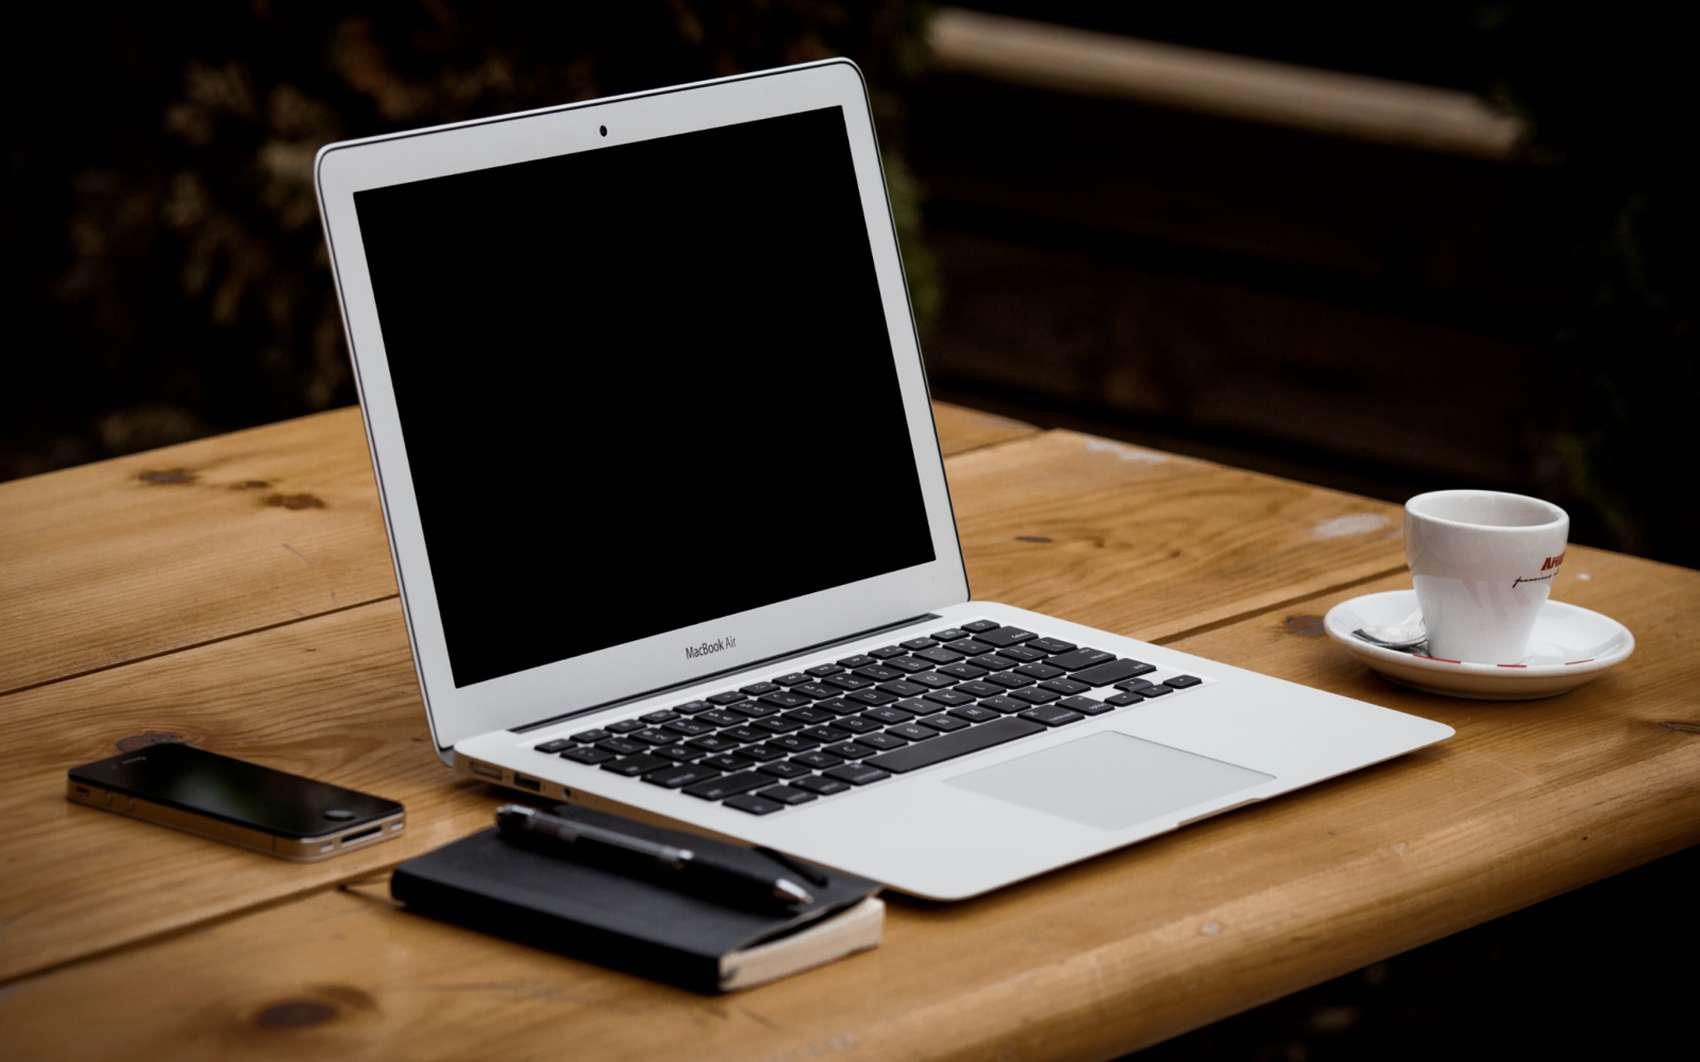 Black Friday 2020 : les meilleures offres PC portable sur Cdiscount © Wikipedia